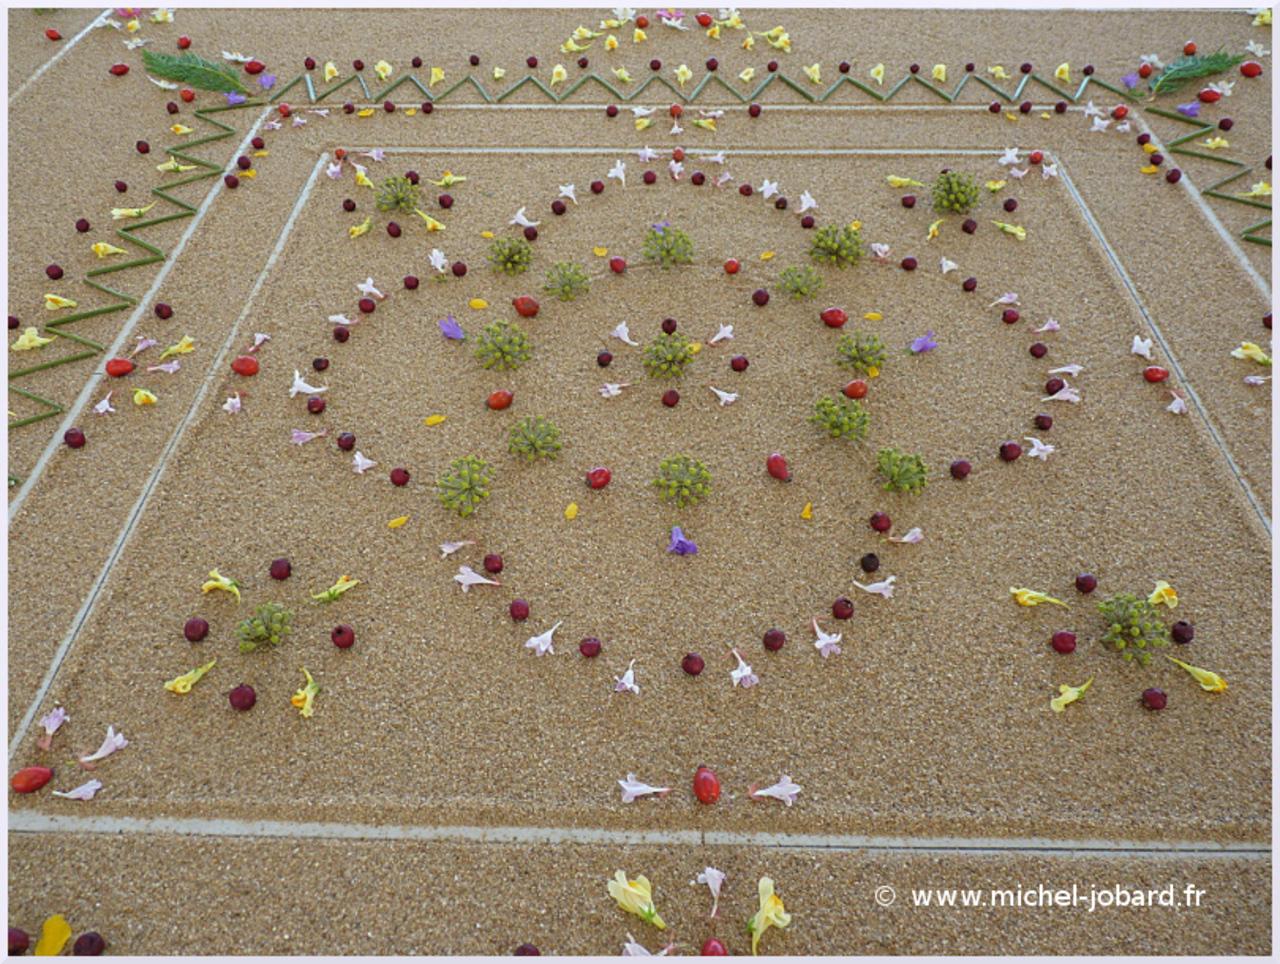 Land-art-mandala-de-la-clairière-04.jpg